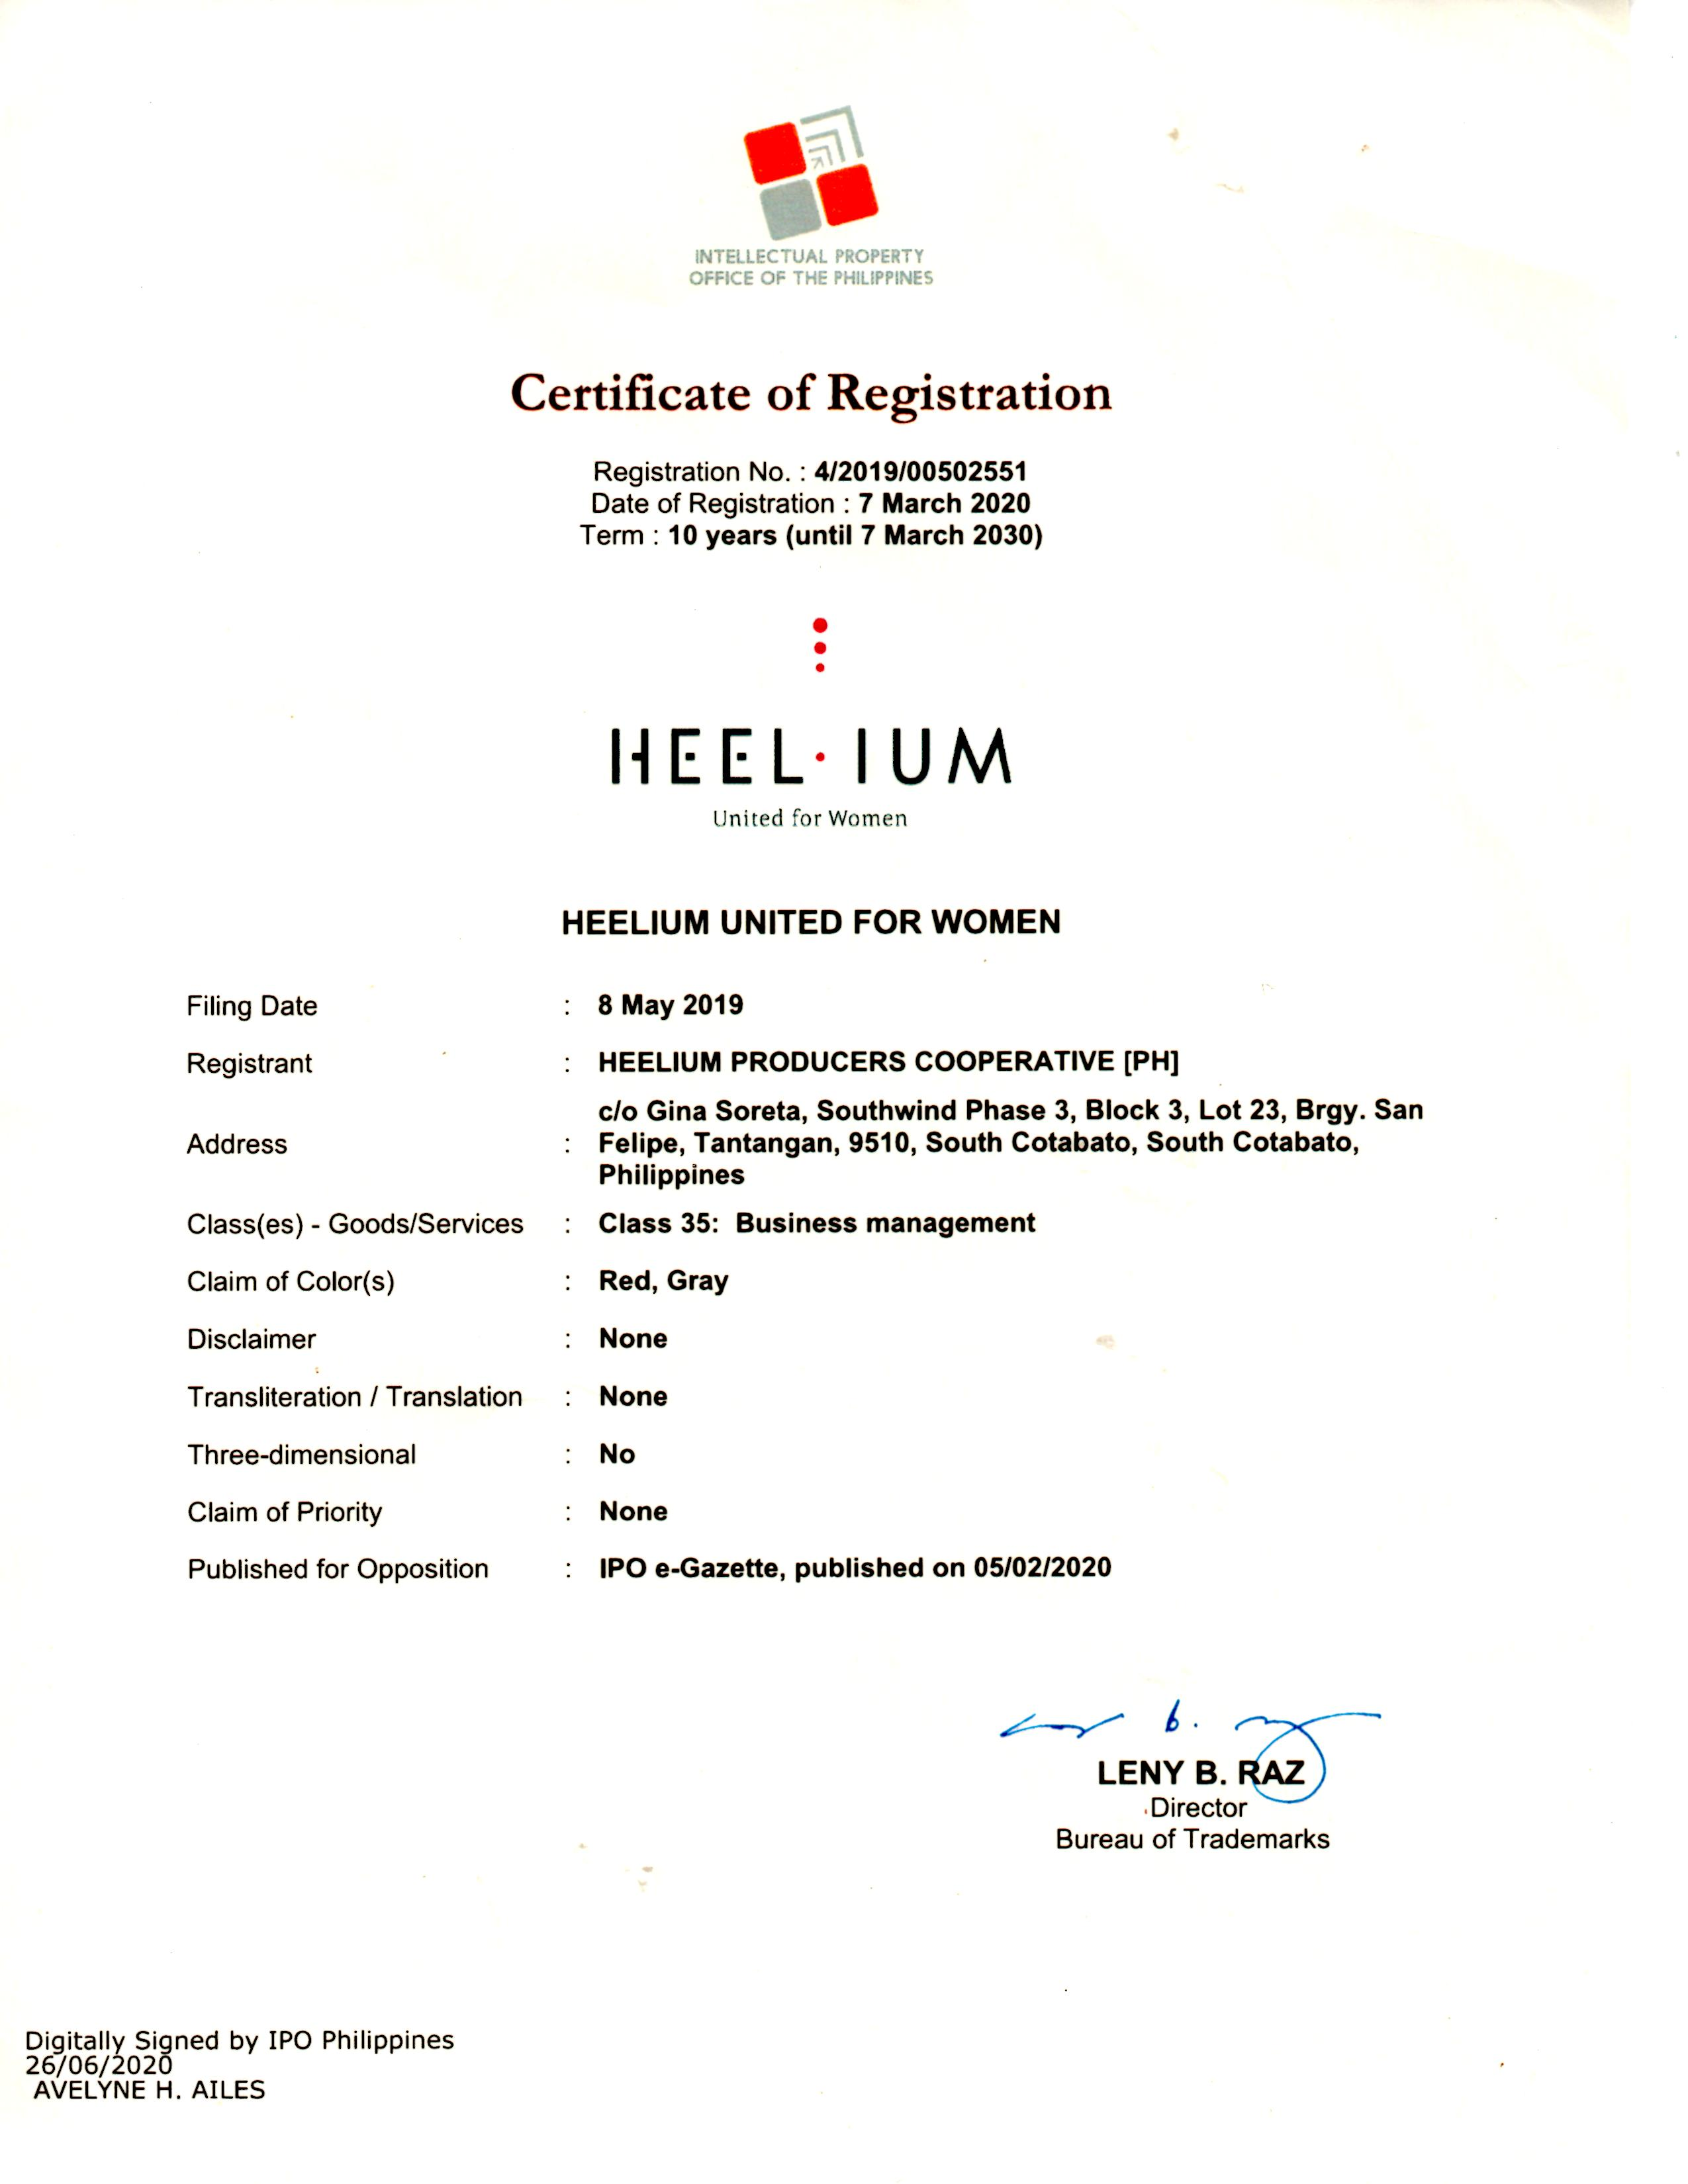 #3- Heelium Brand registration